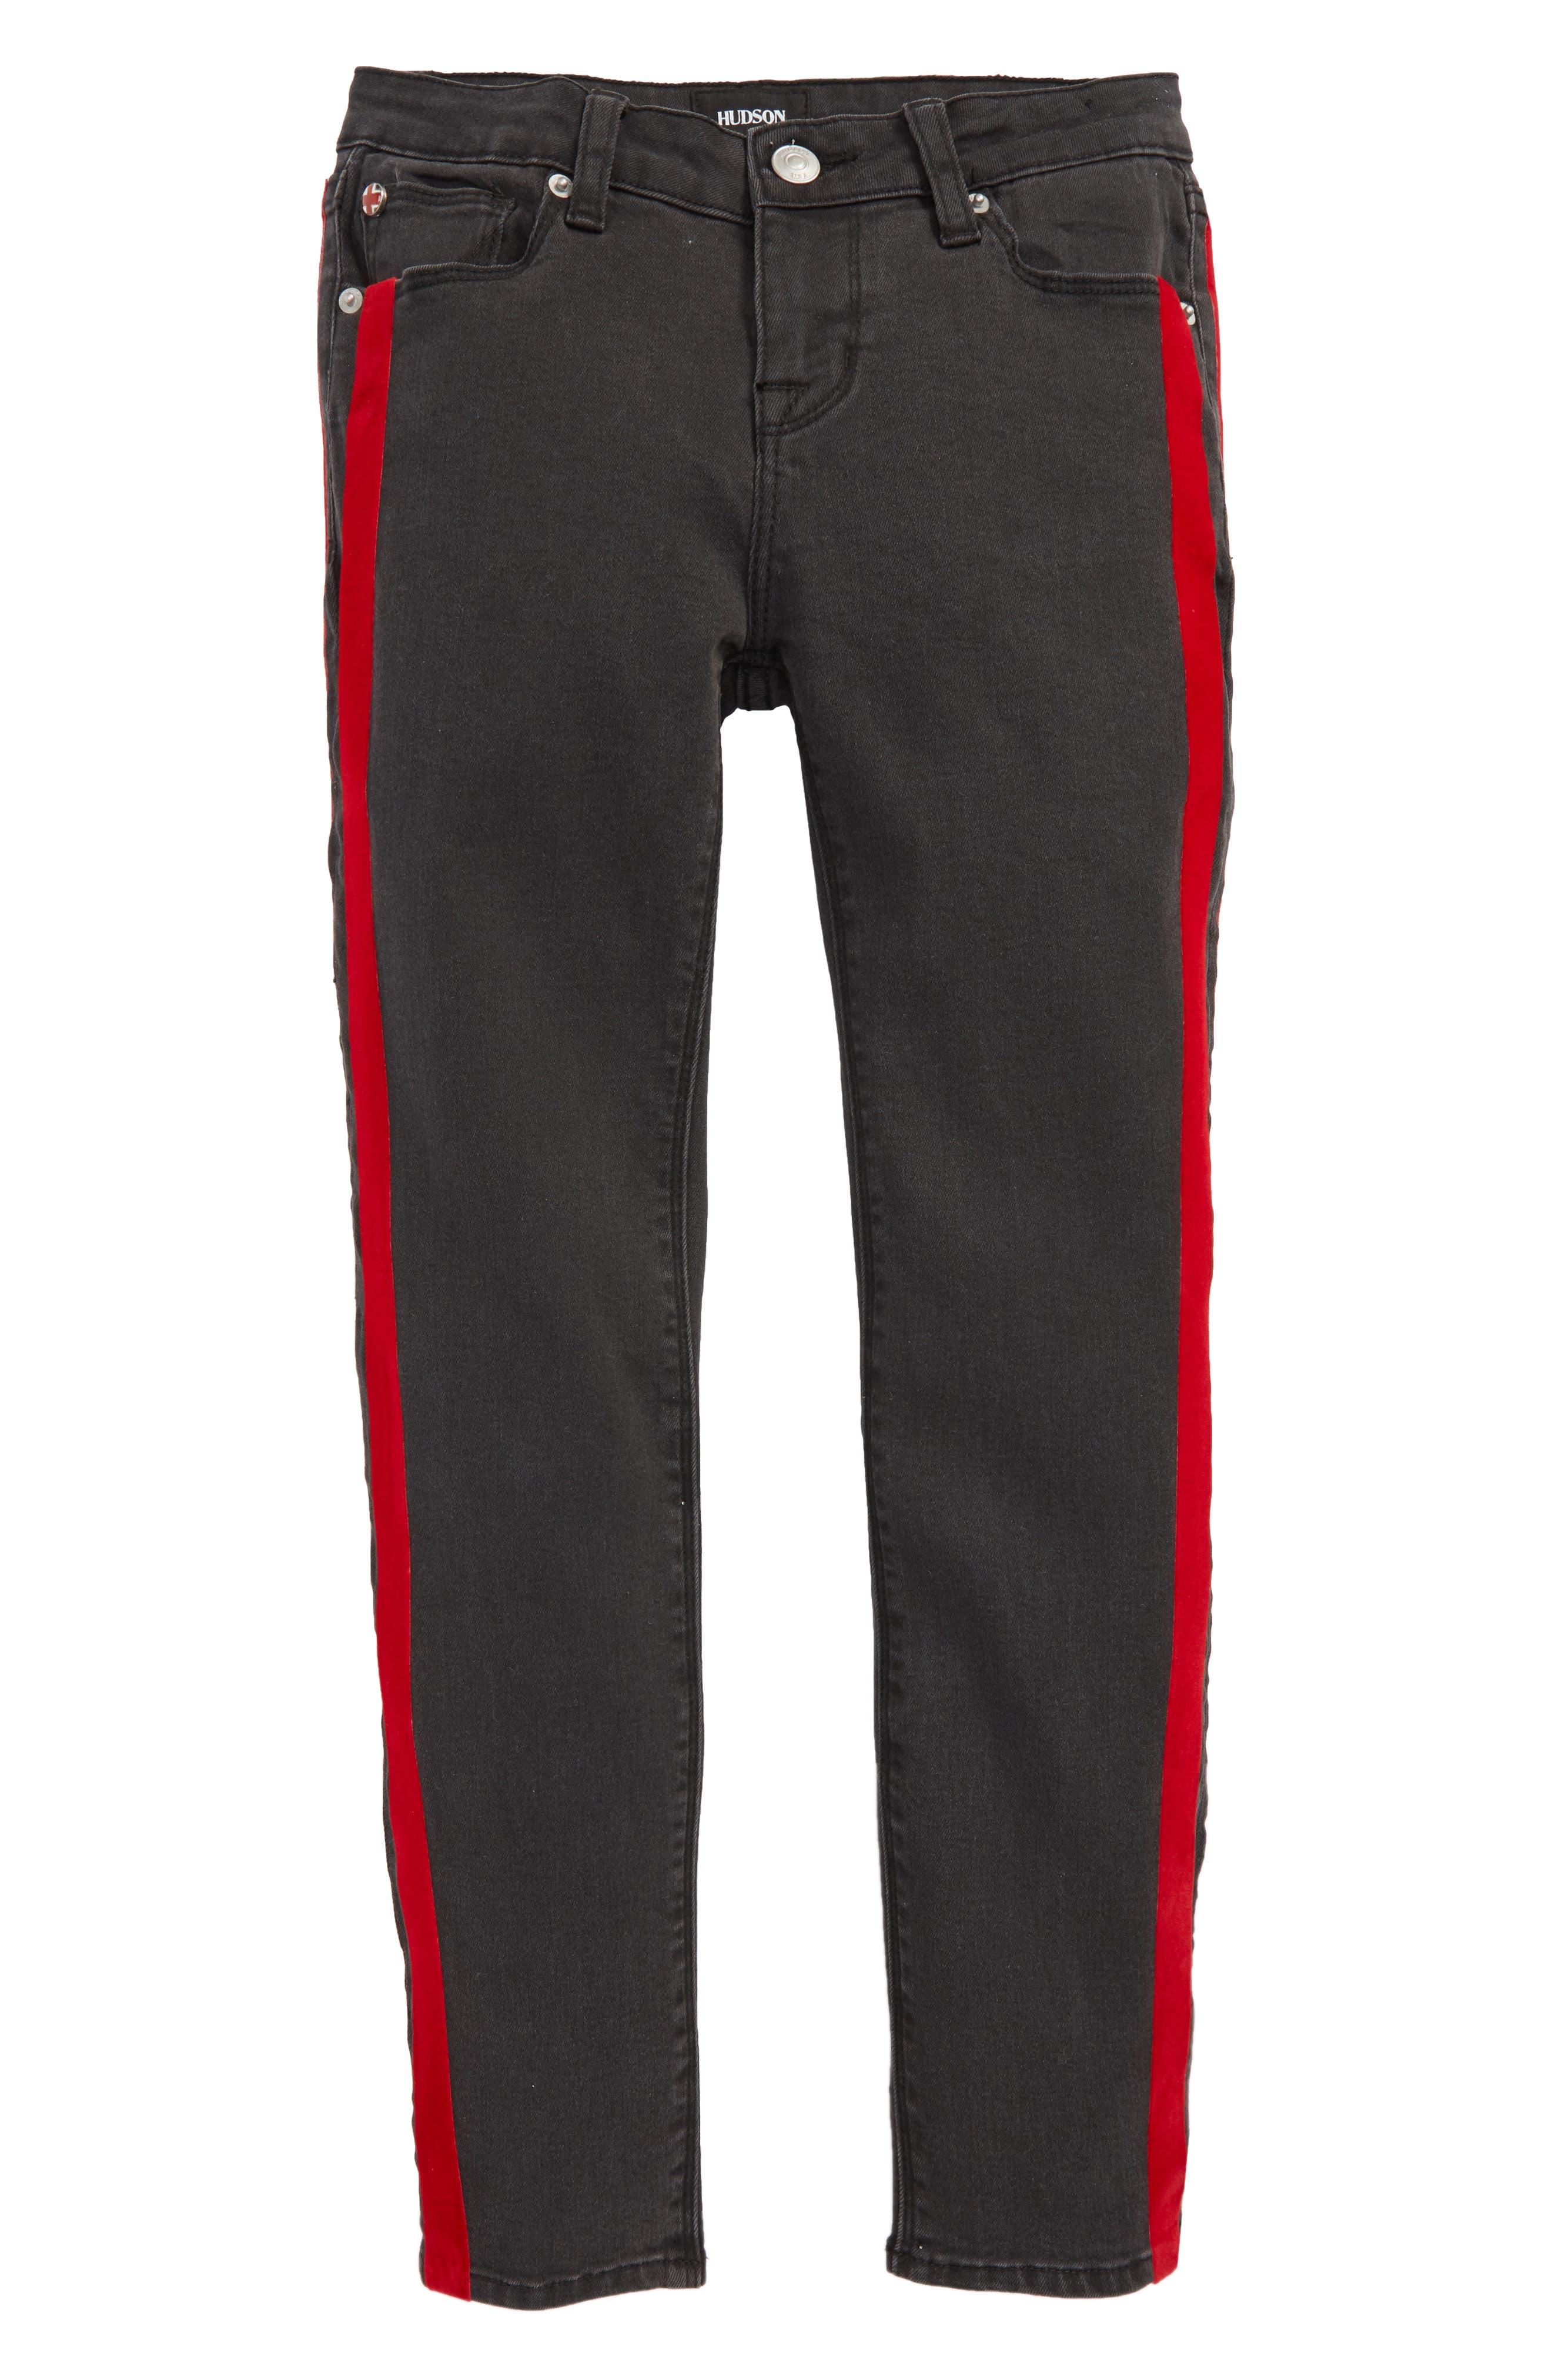 Image of HUDSON Jeans Keira Side Stripe Skinny Jeans